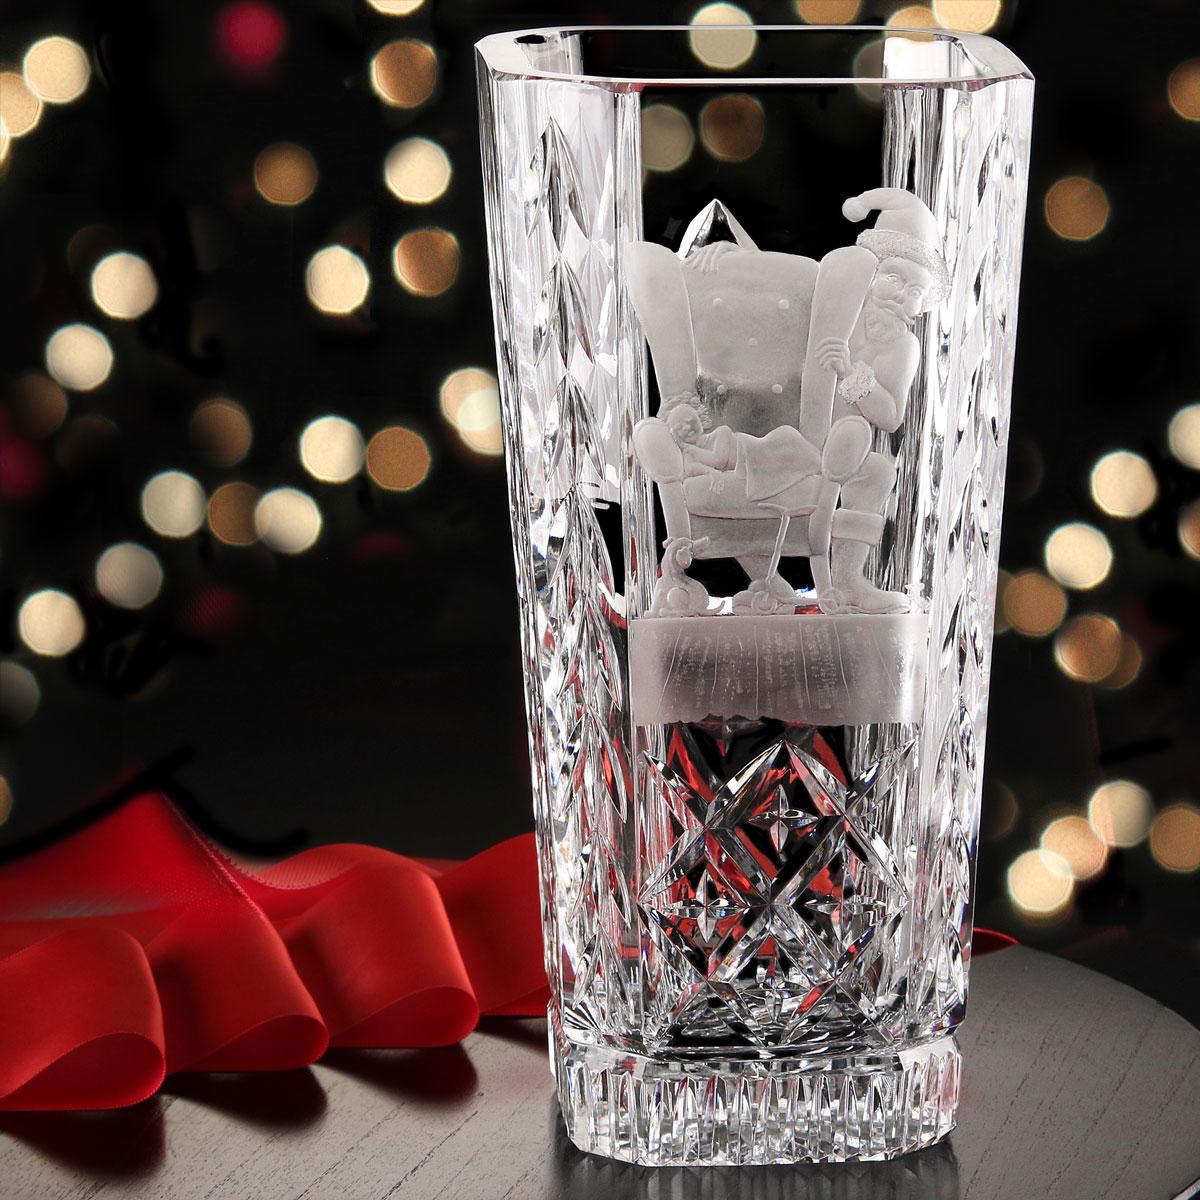 Cashs Crystal Art Collection, Santa Shhh! Vase